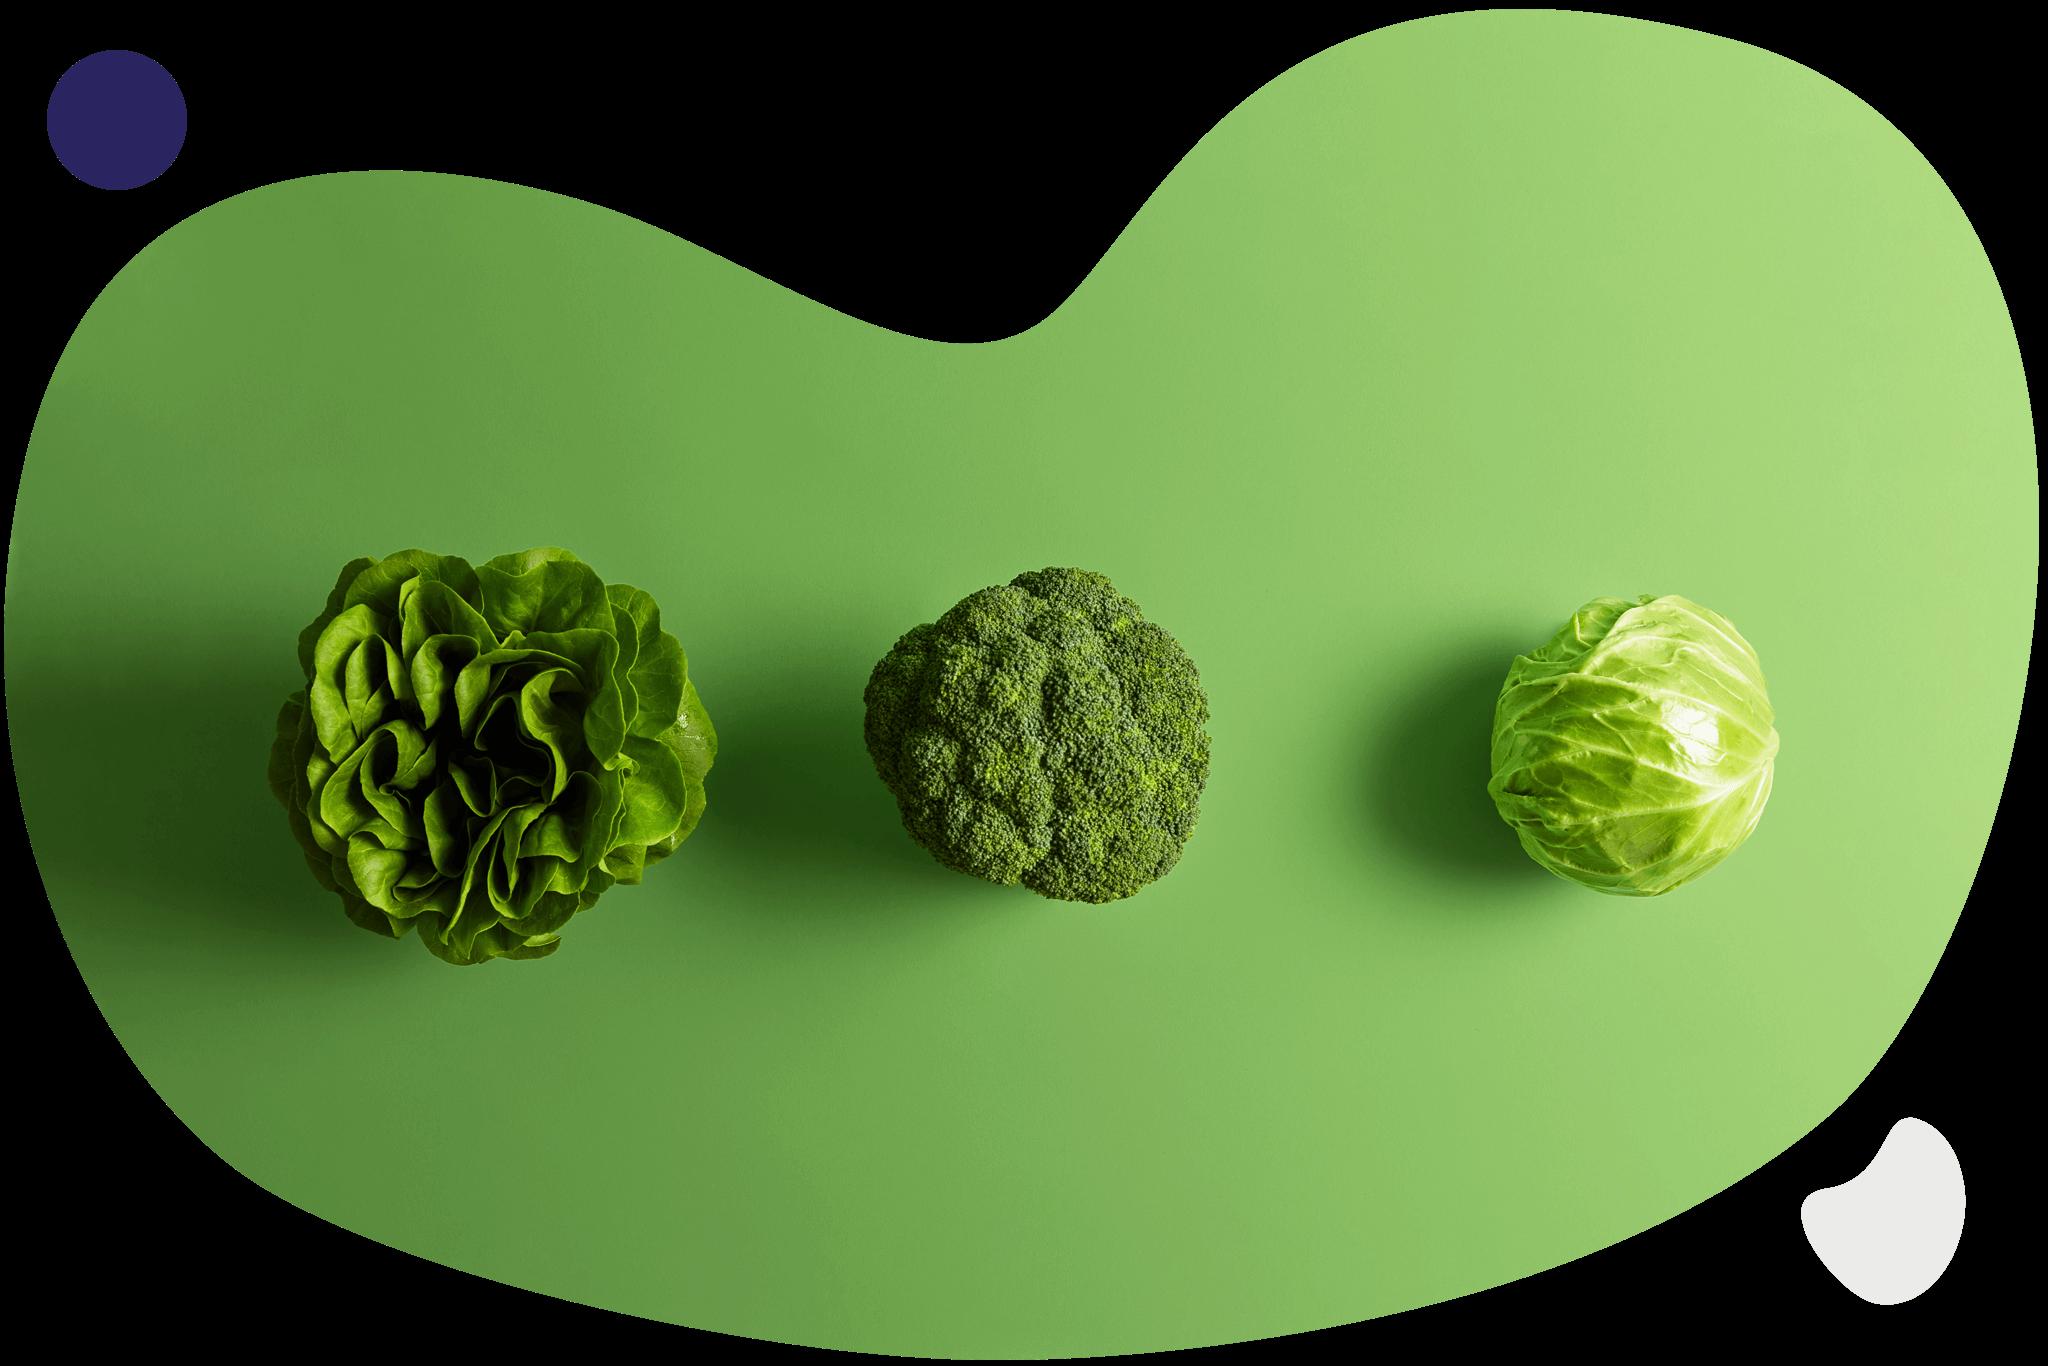 Salade, brocoli, chou